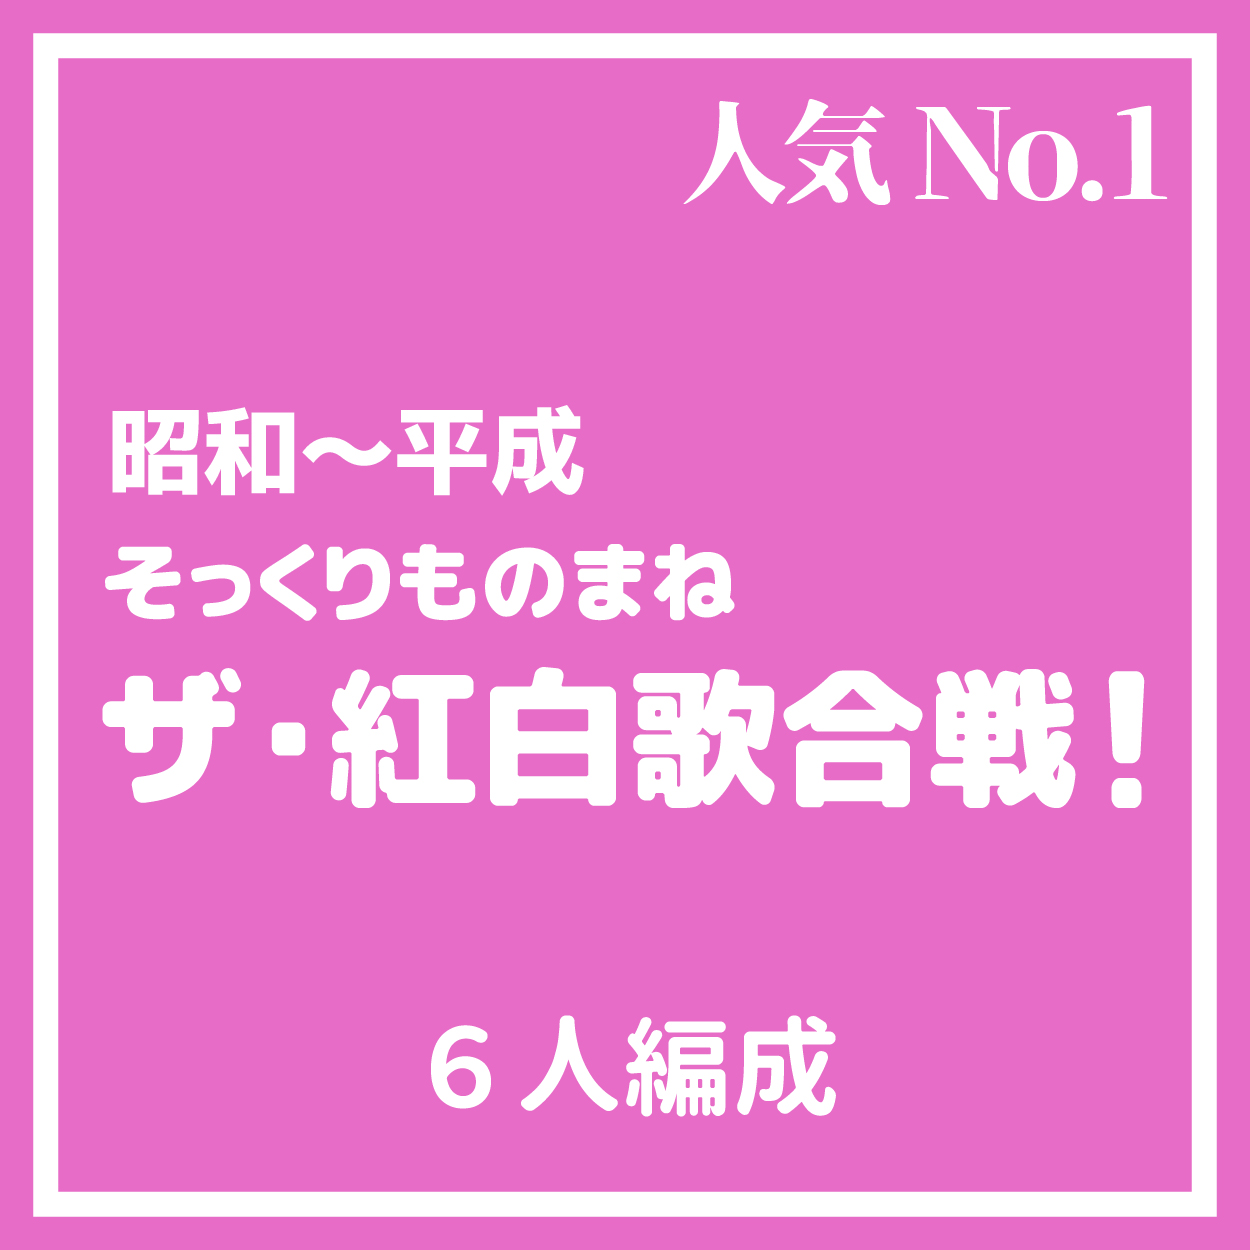 ザ・紅白歌合戦!【人気NO.1】